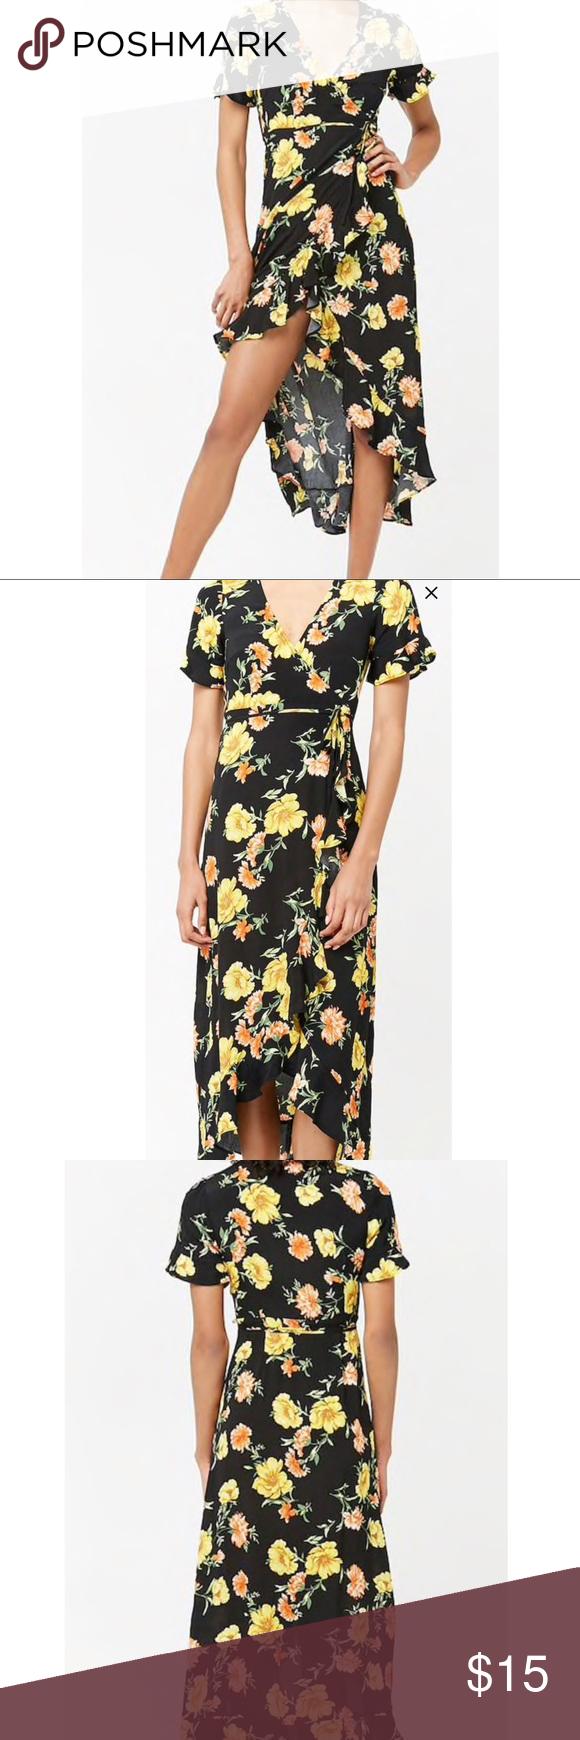 Forever 21 Nwt Black Floral Xl Women S Dress Womens Dresses Long Wrap Dress Dresses [ 1740 x 580 Pixel ]